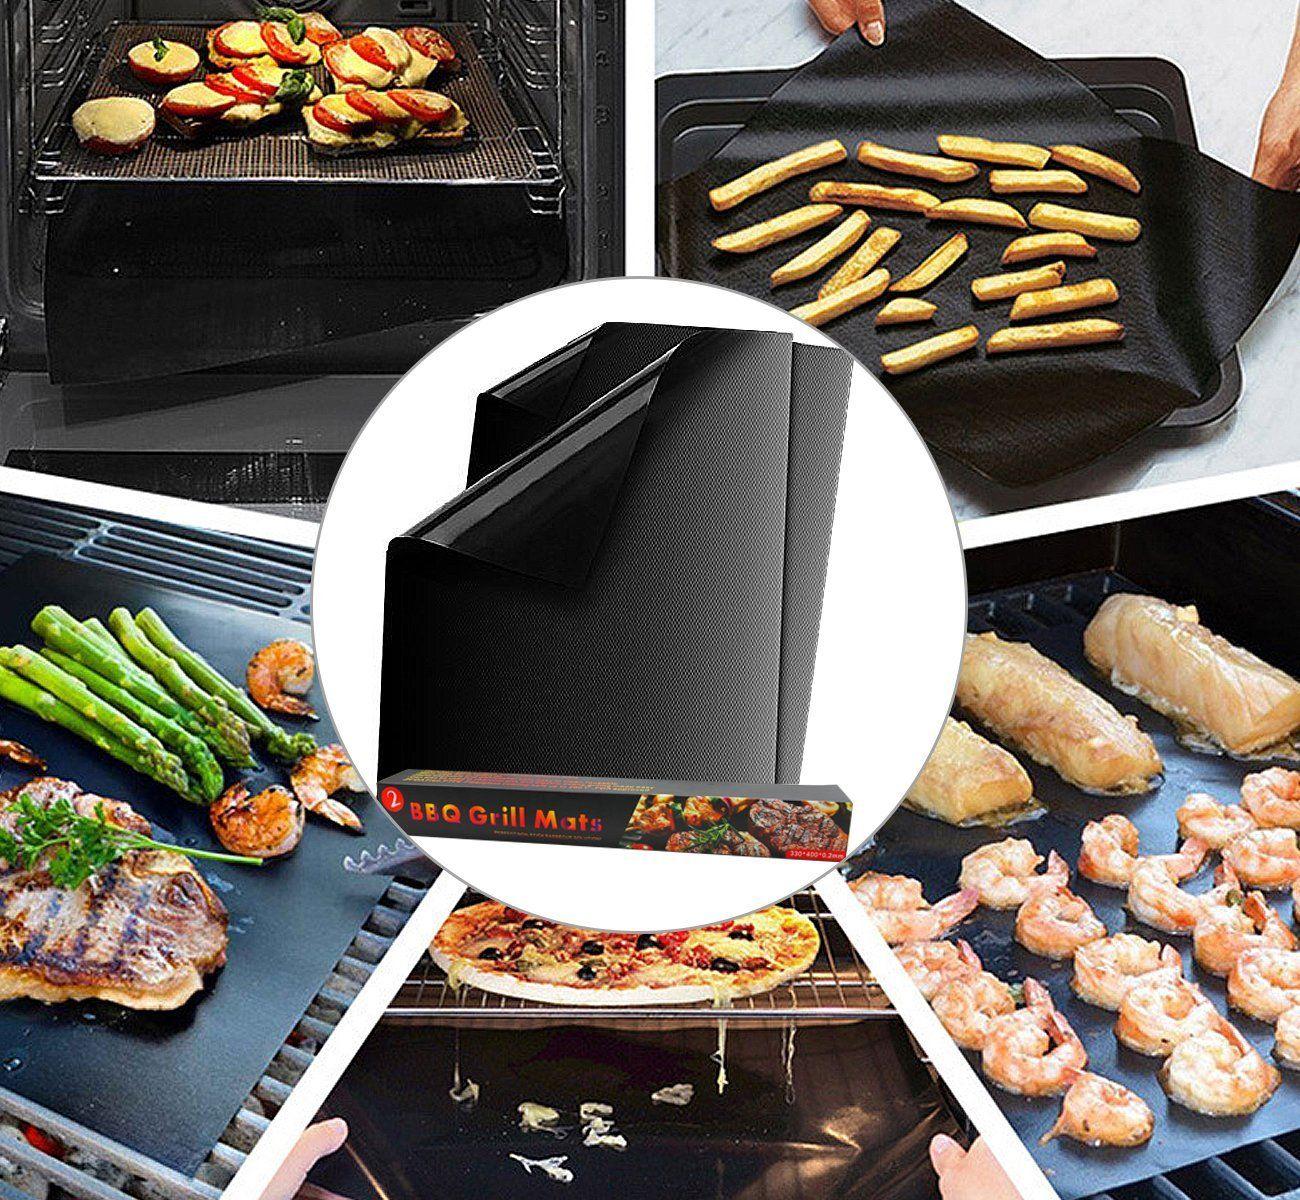 Amazon Com Grill Mats 16 X 13 Inch Non Stick Bbq Grill Baking